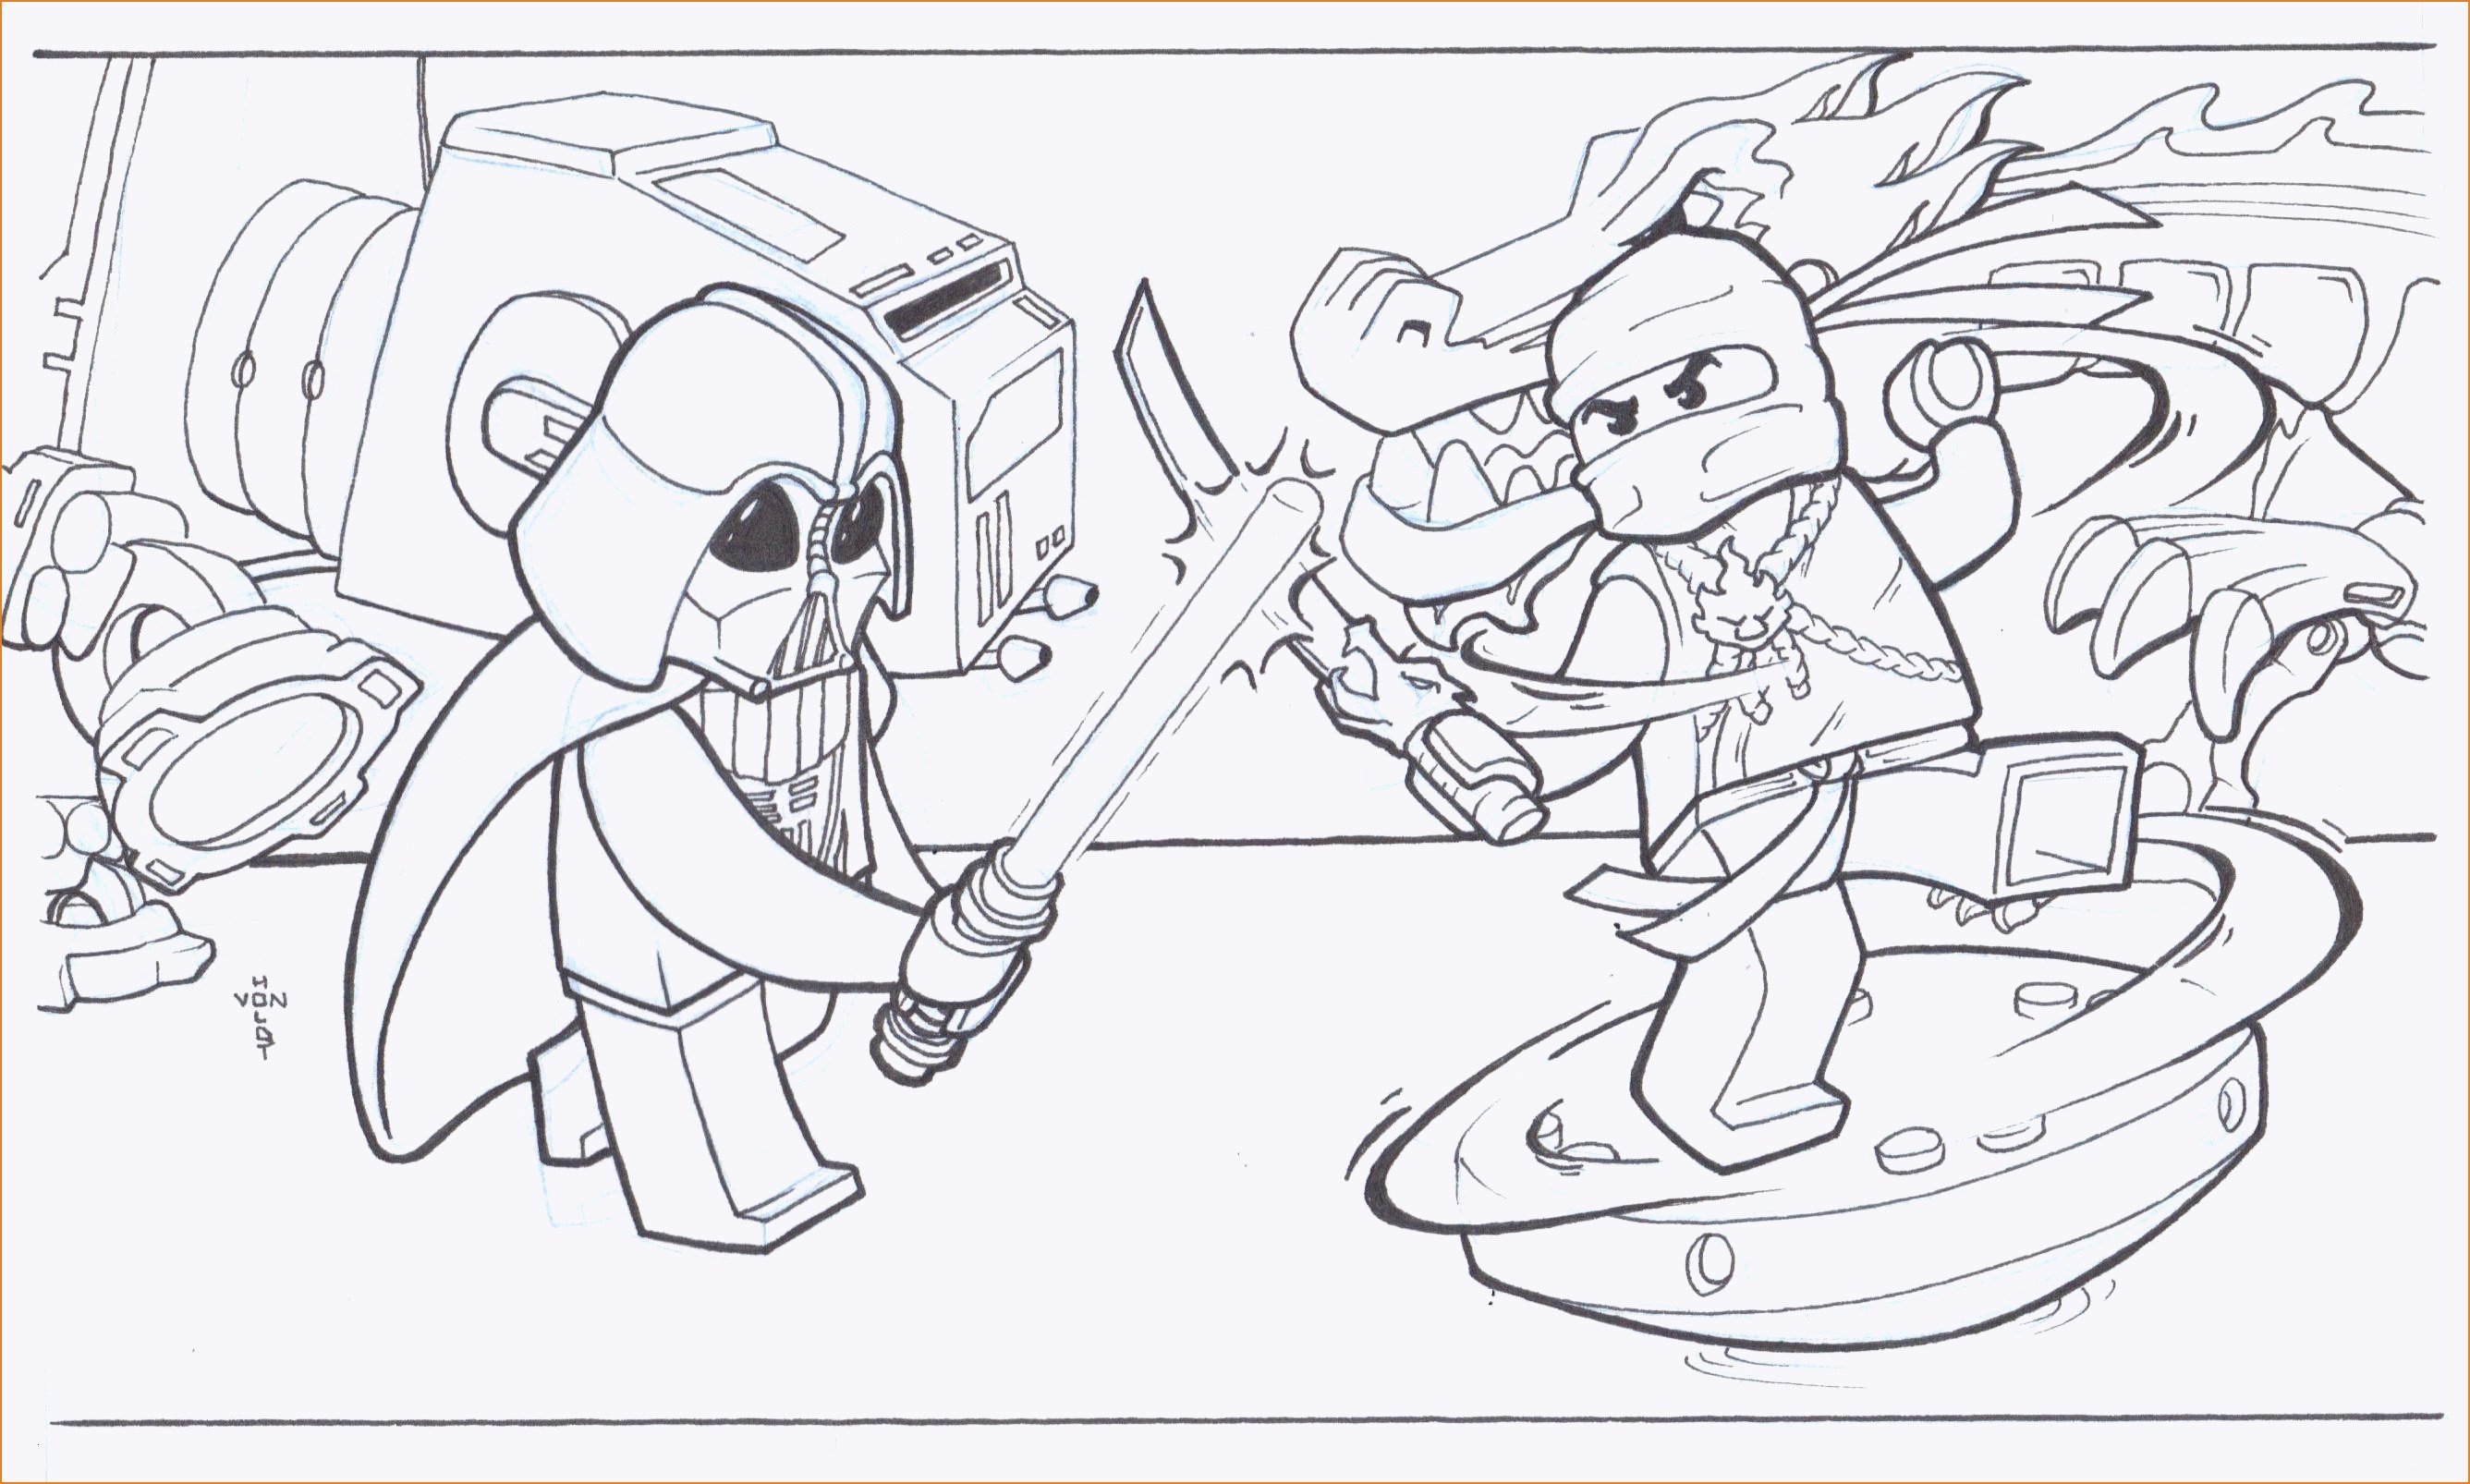 Ninjago Bilder Zum Ausdrucken Kostenlos Inspirierend 40 Ninjago Ausmalbilder Zane Scoredatscore Genial Ninjago Galerie